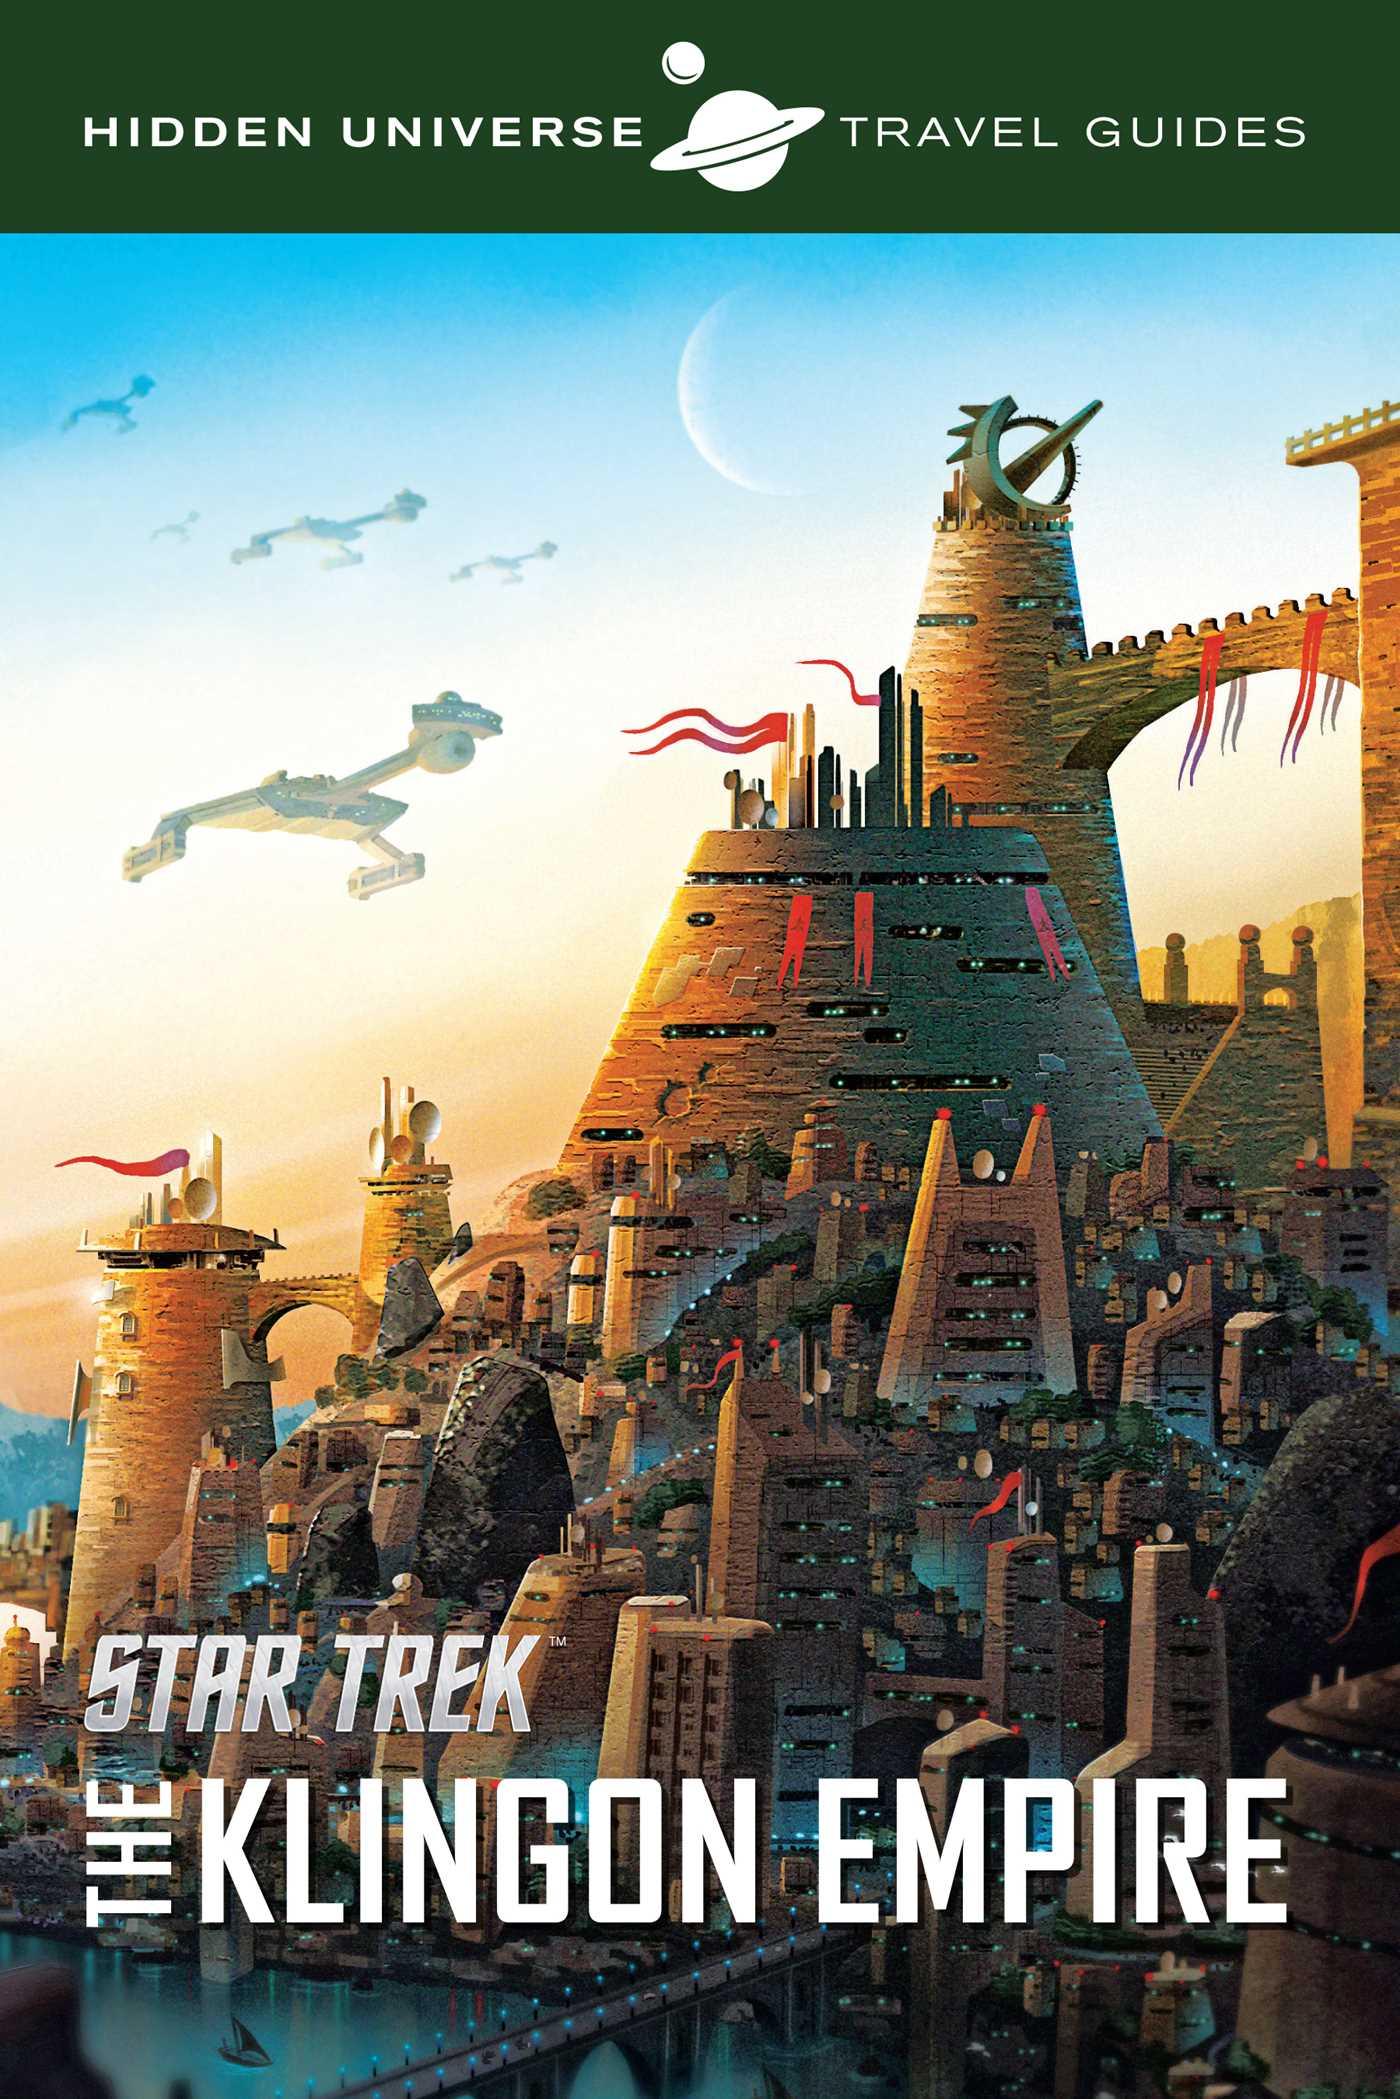 Hidden universe travel guides star trek 9781683830467 hr